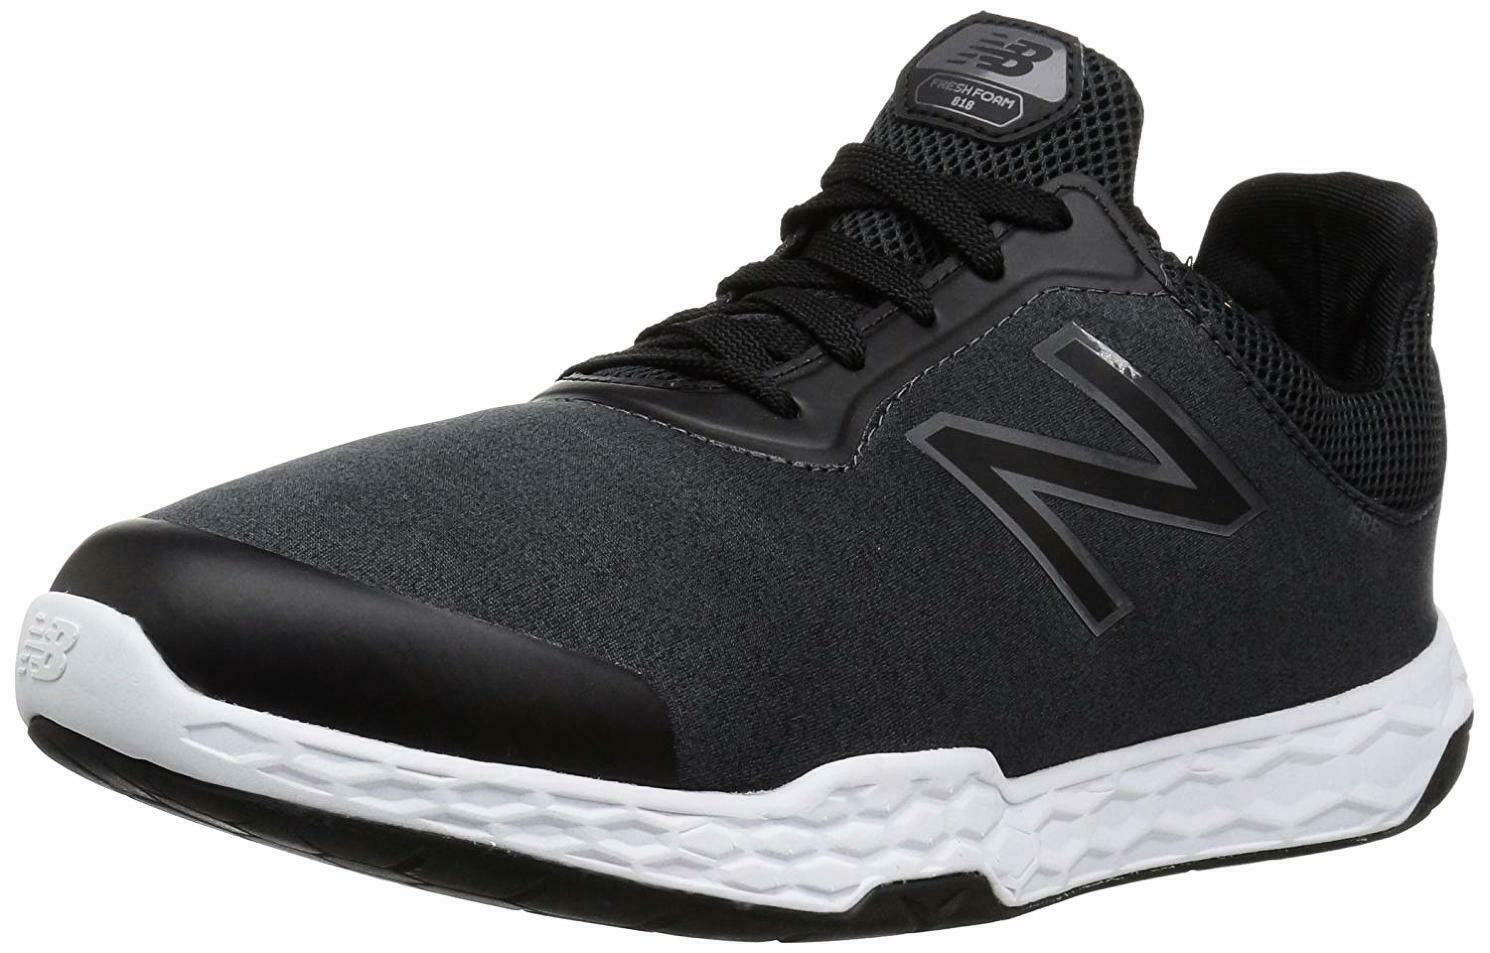 3521ad3ff3 New Balance Men's 818v3 Fresh Foam Trainer - SZ color Cross Choose  nuqdbx1037-Athletic Shoes